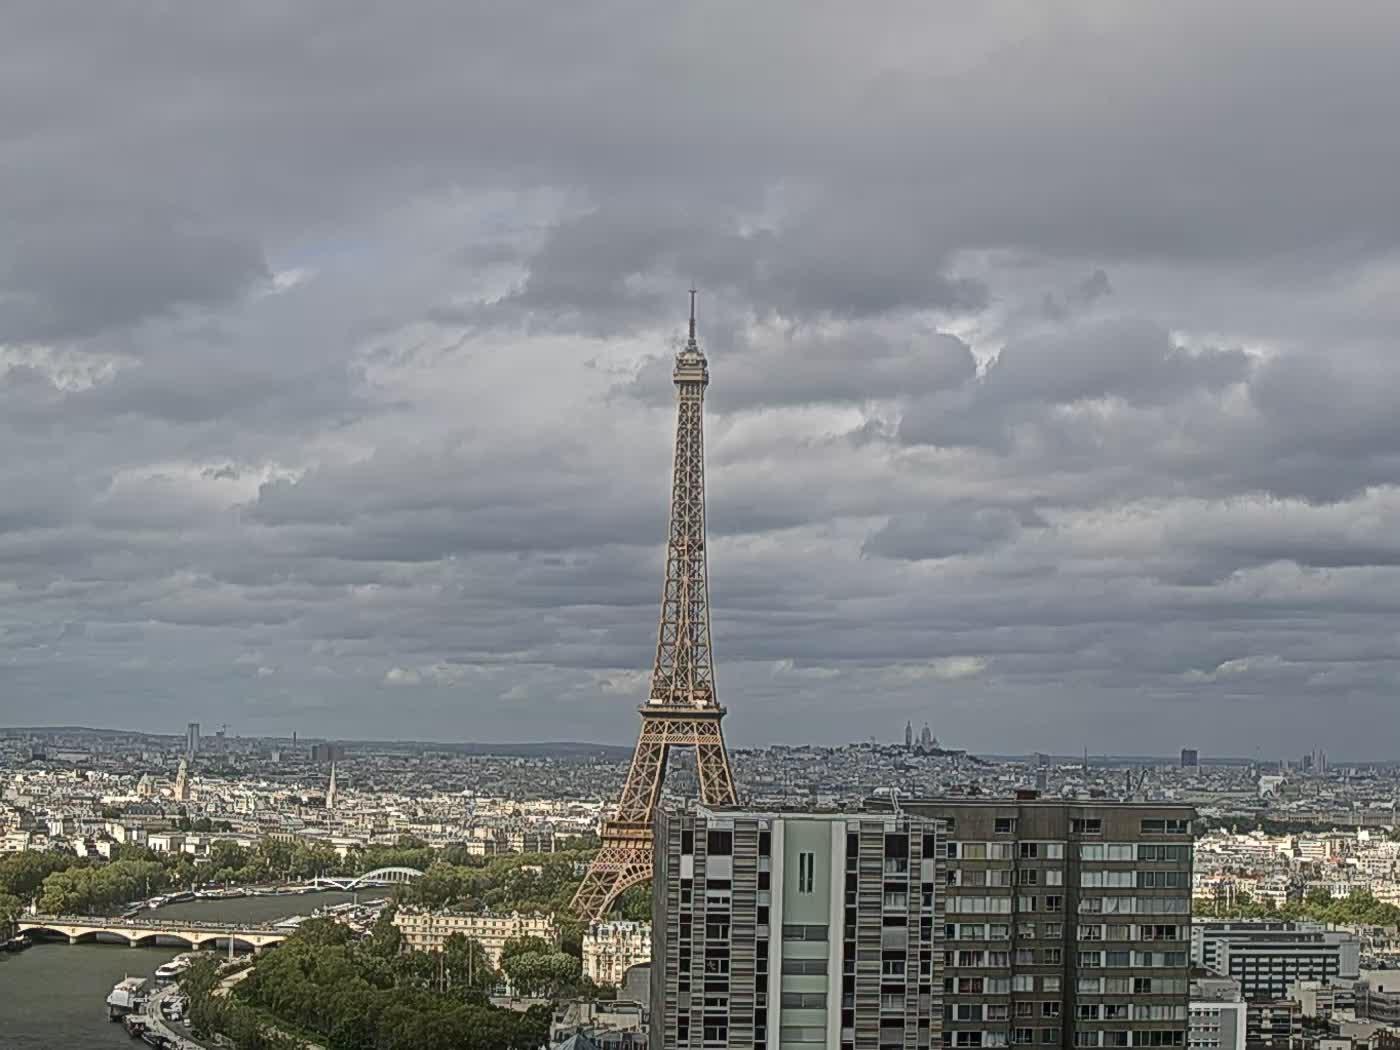 Paris Thu. 17:22